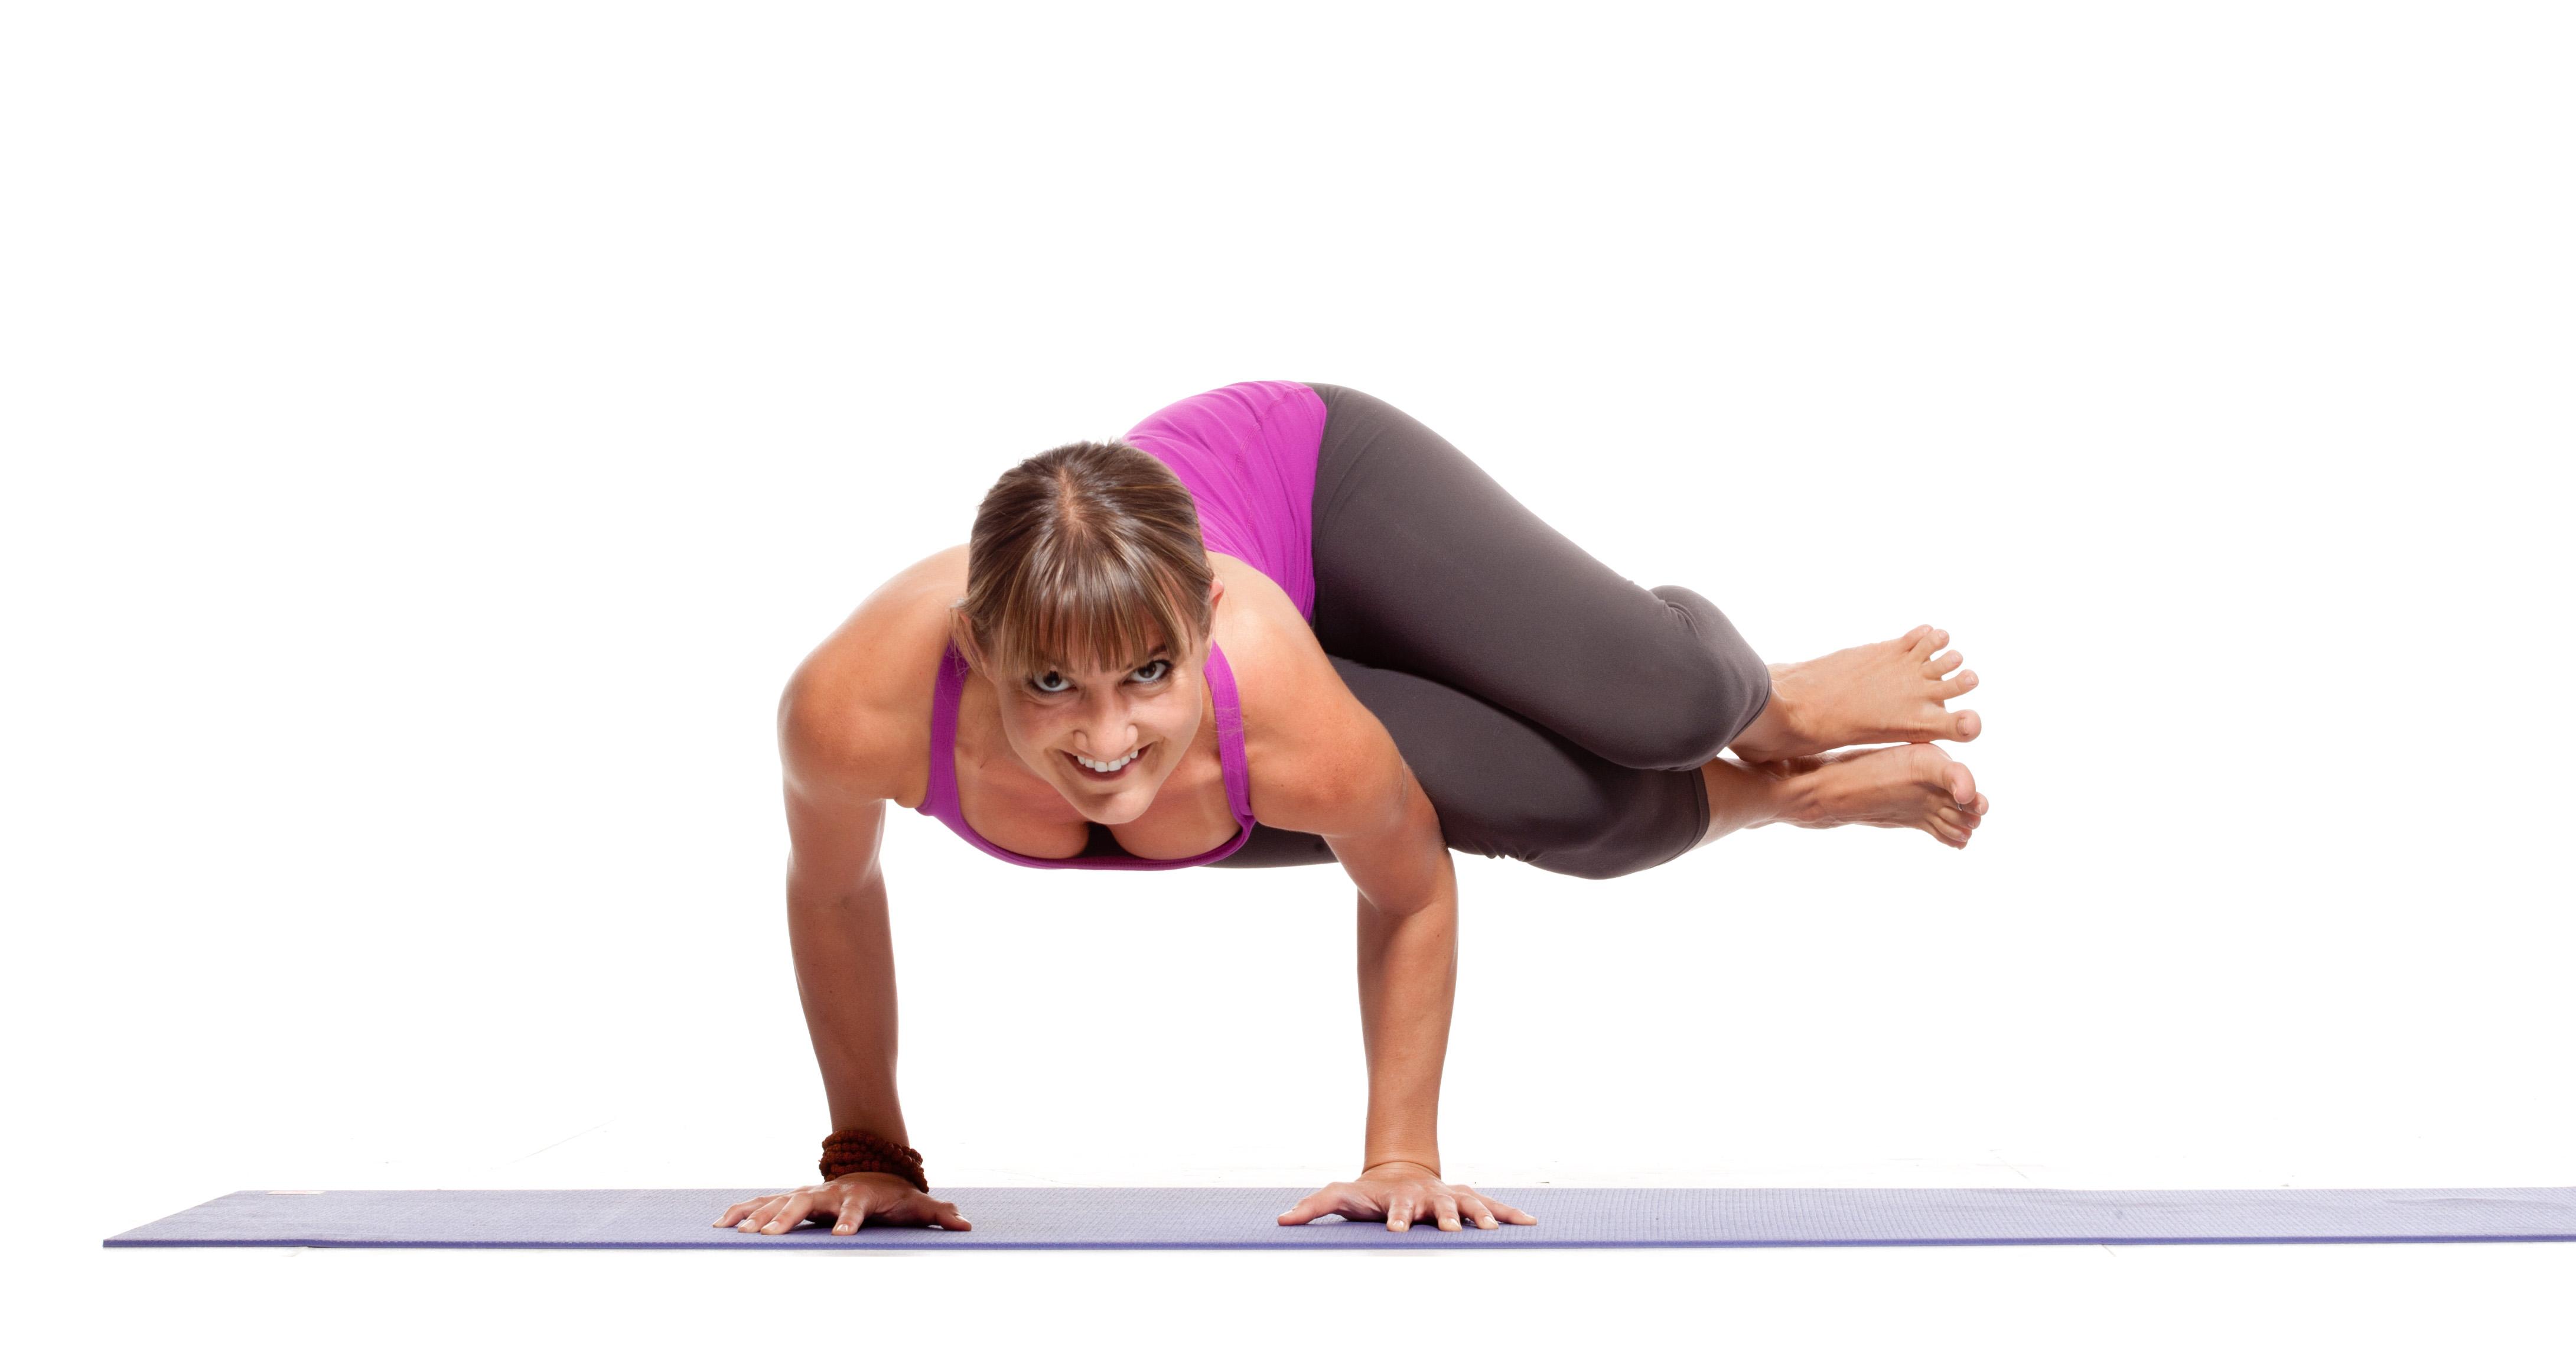 10 insane yoga poses you wish you could strike doyouyogacom - 1280×720